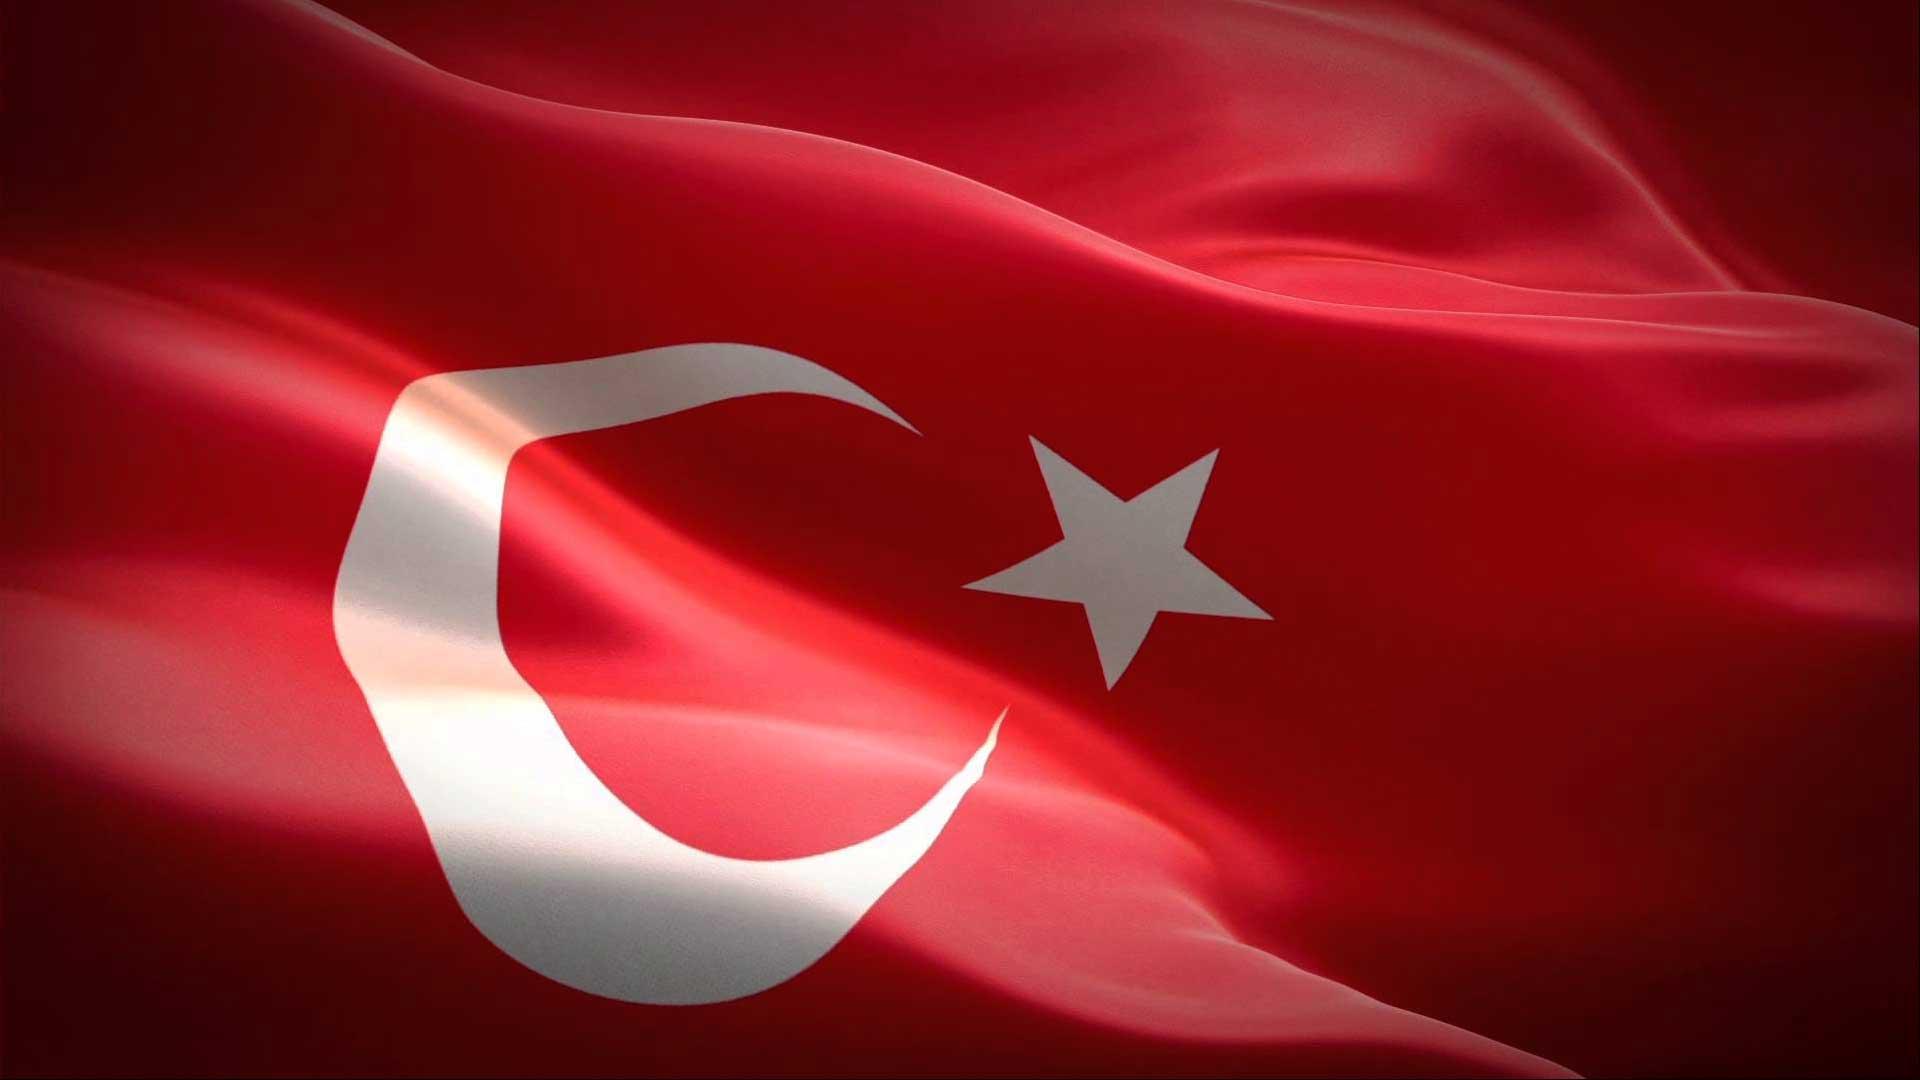 hd-turk-bayragi-masaustu-resimleri-21.jpg